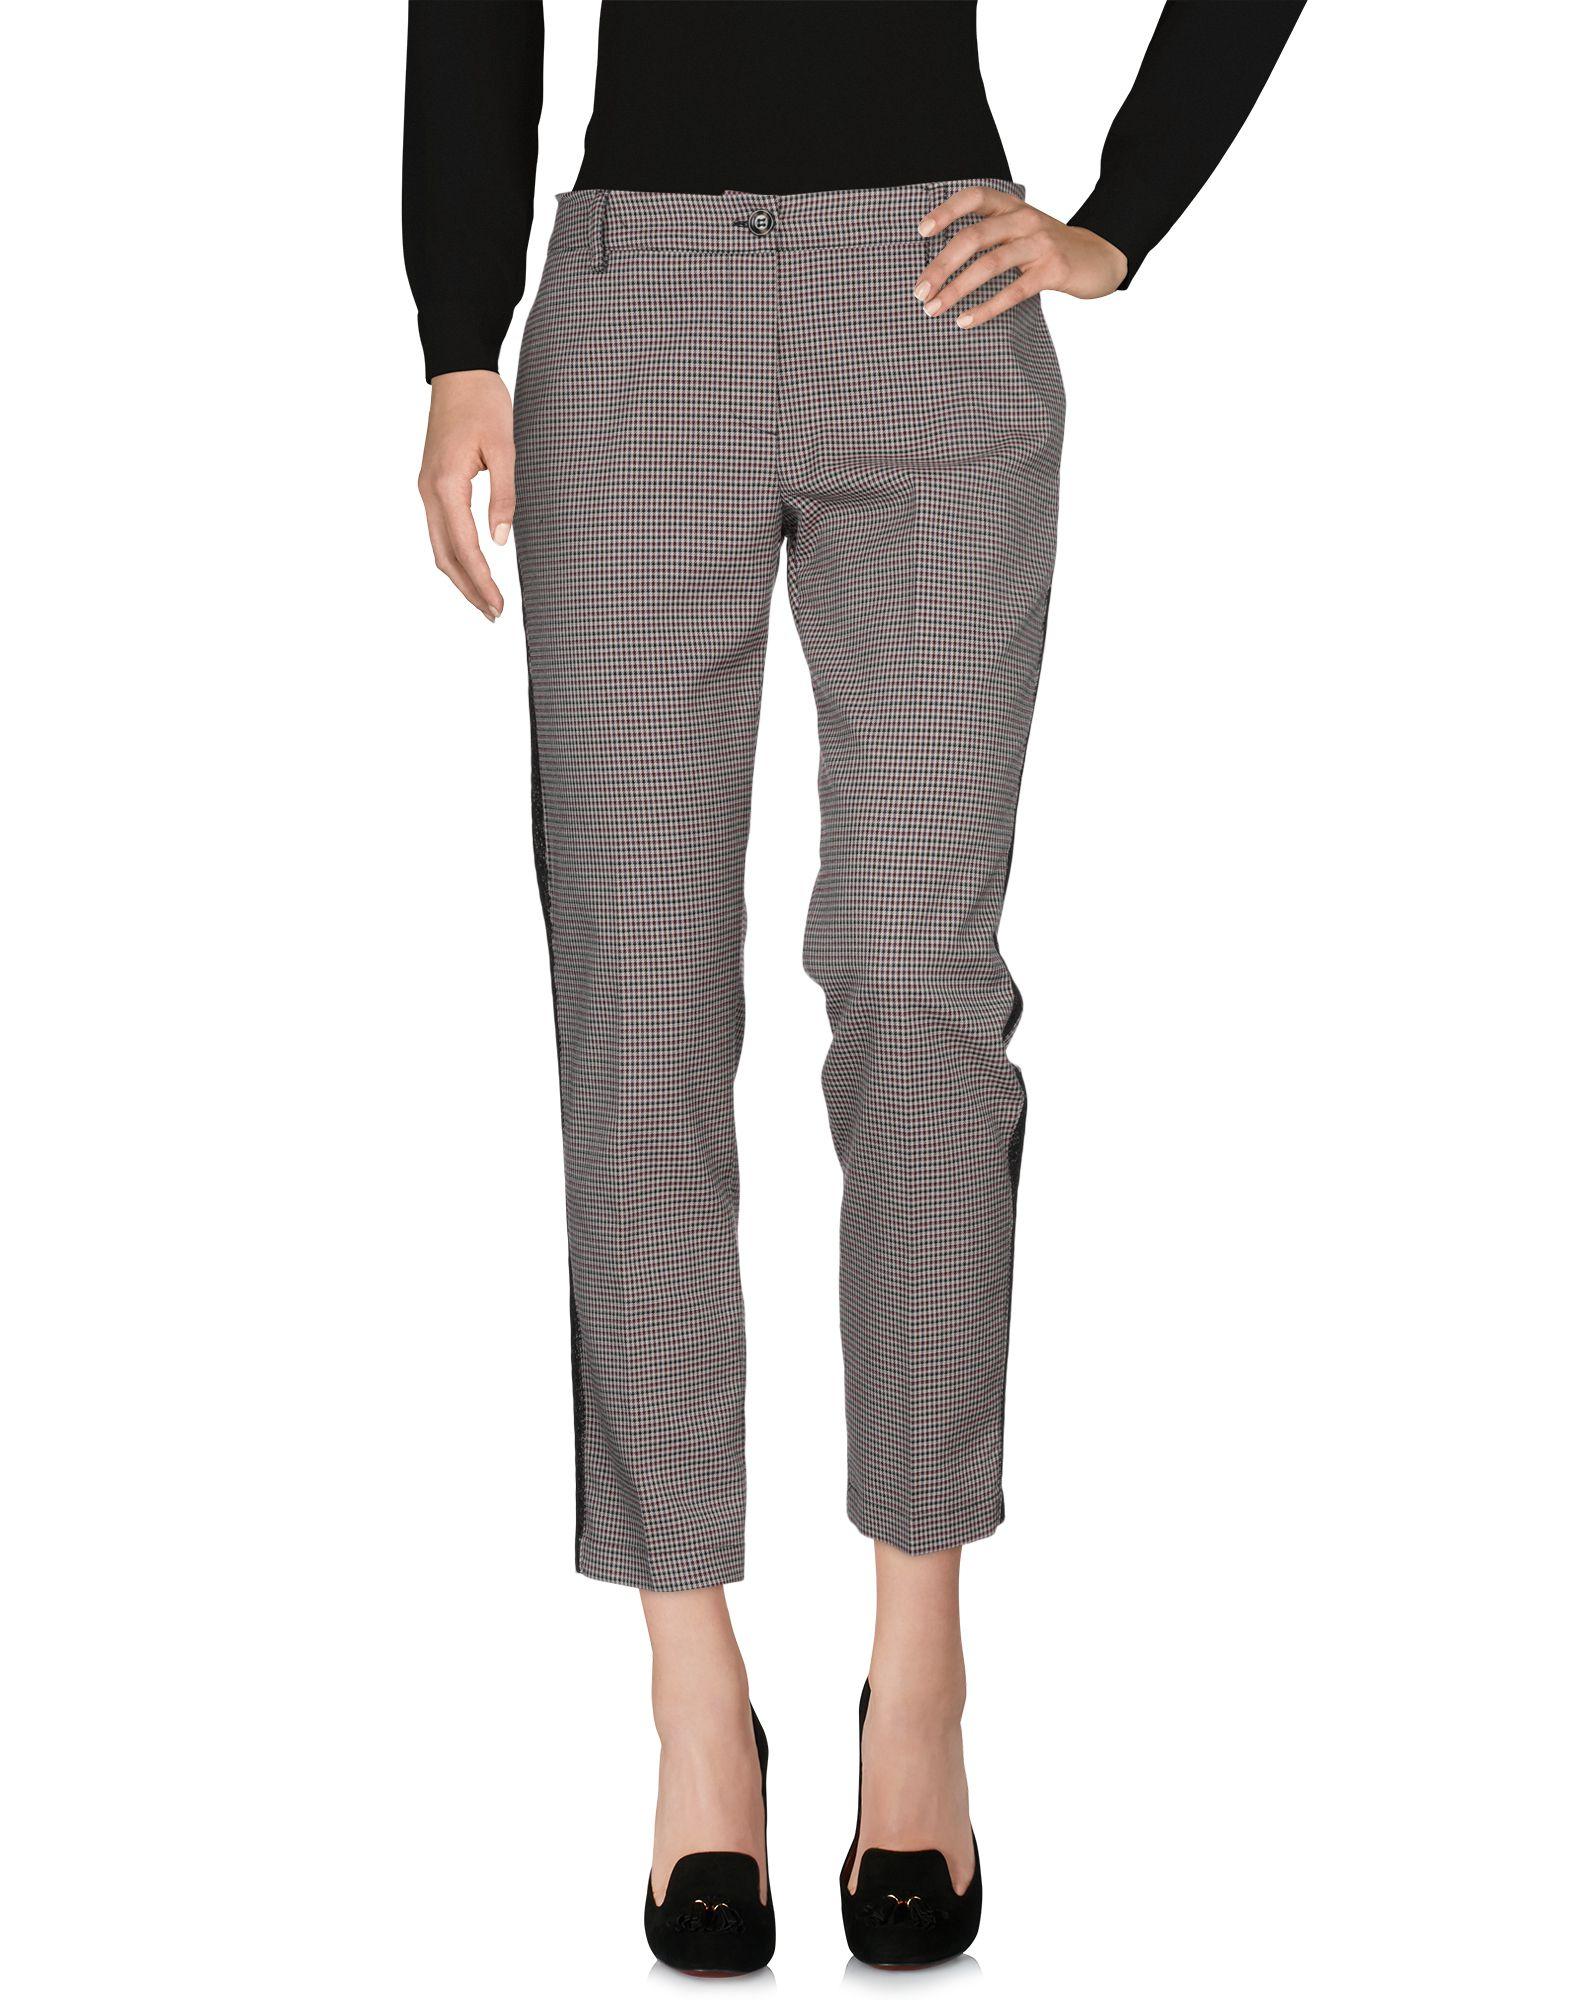 CRISTINA GAVIOLI COLLECTION Повседневные брюки брюки cristina gavioli брюки широкие